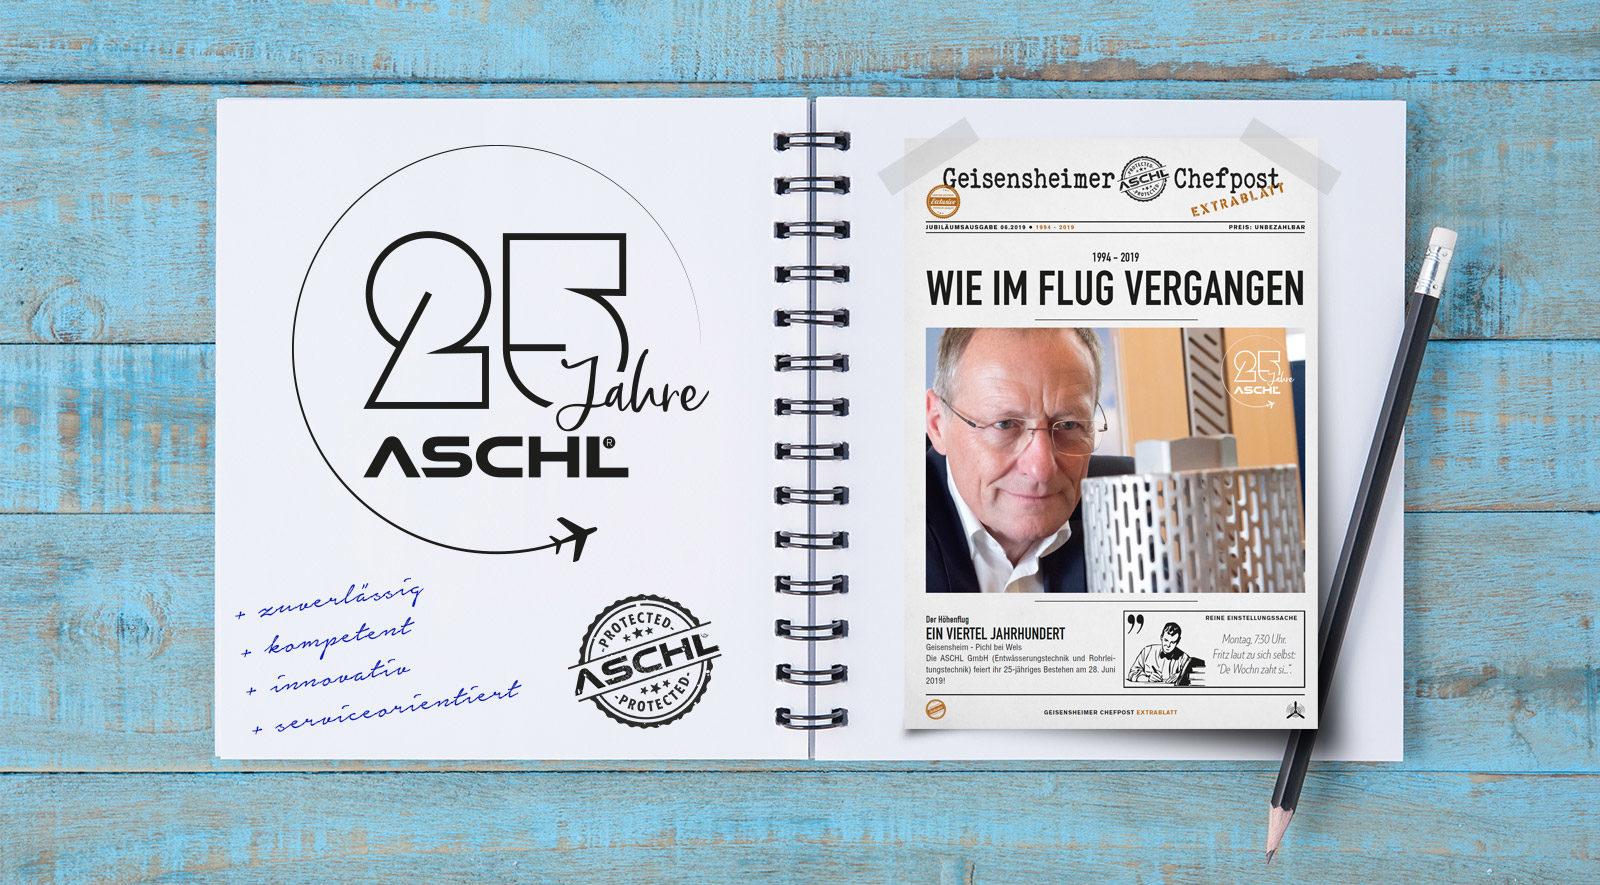 25 Jahre ASCHL / 1A Edelstahl GmbH